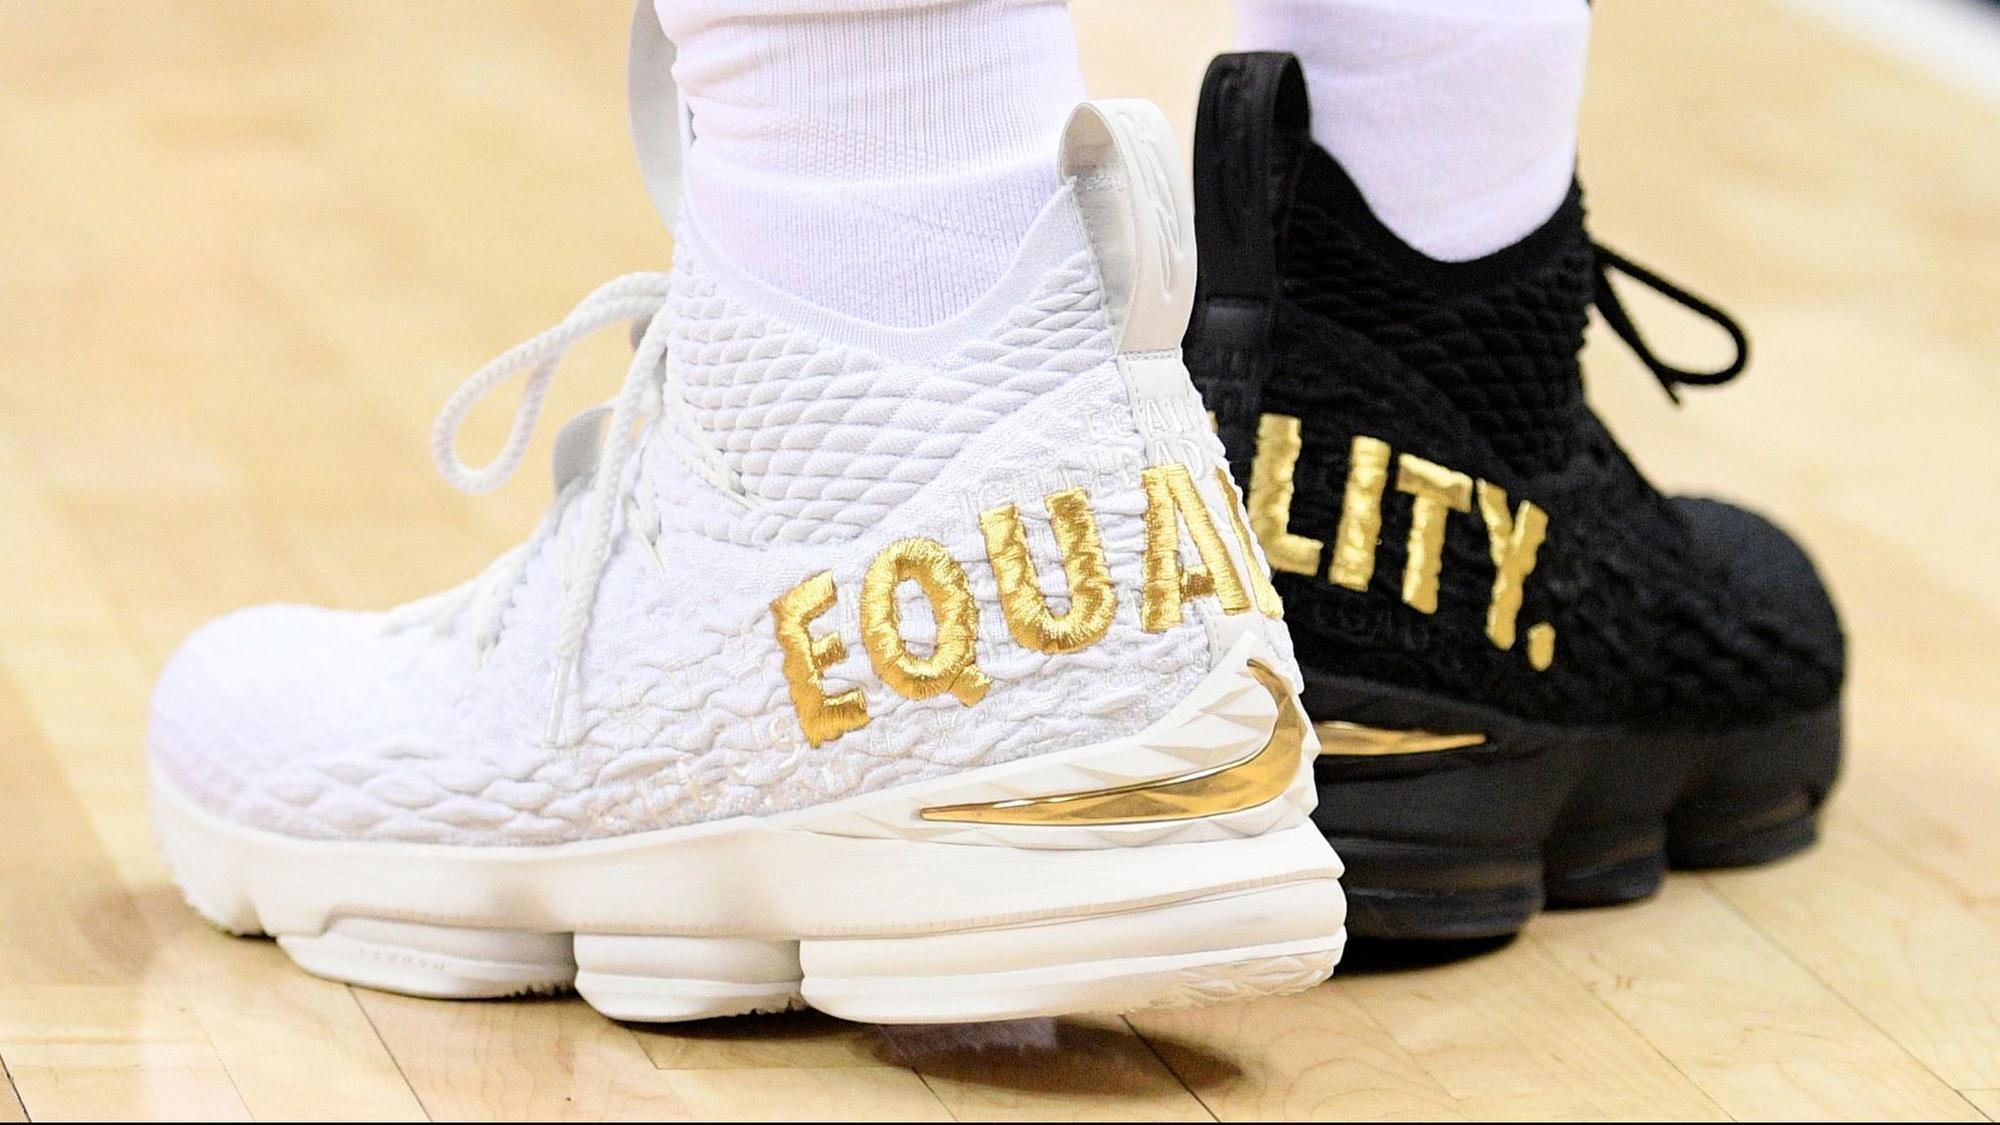 e4731b4a52dd LeBron James wears 1 black shoe